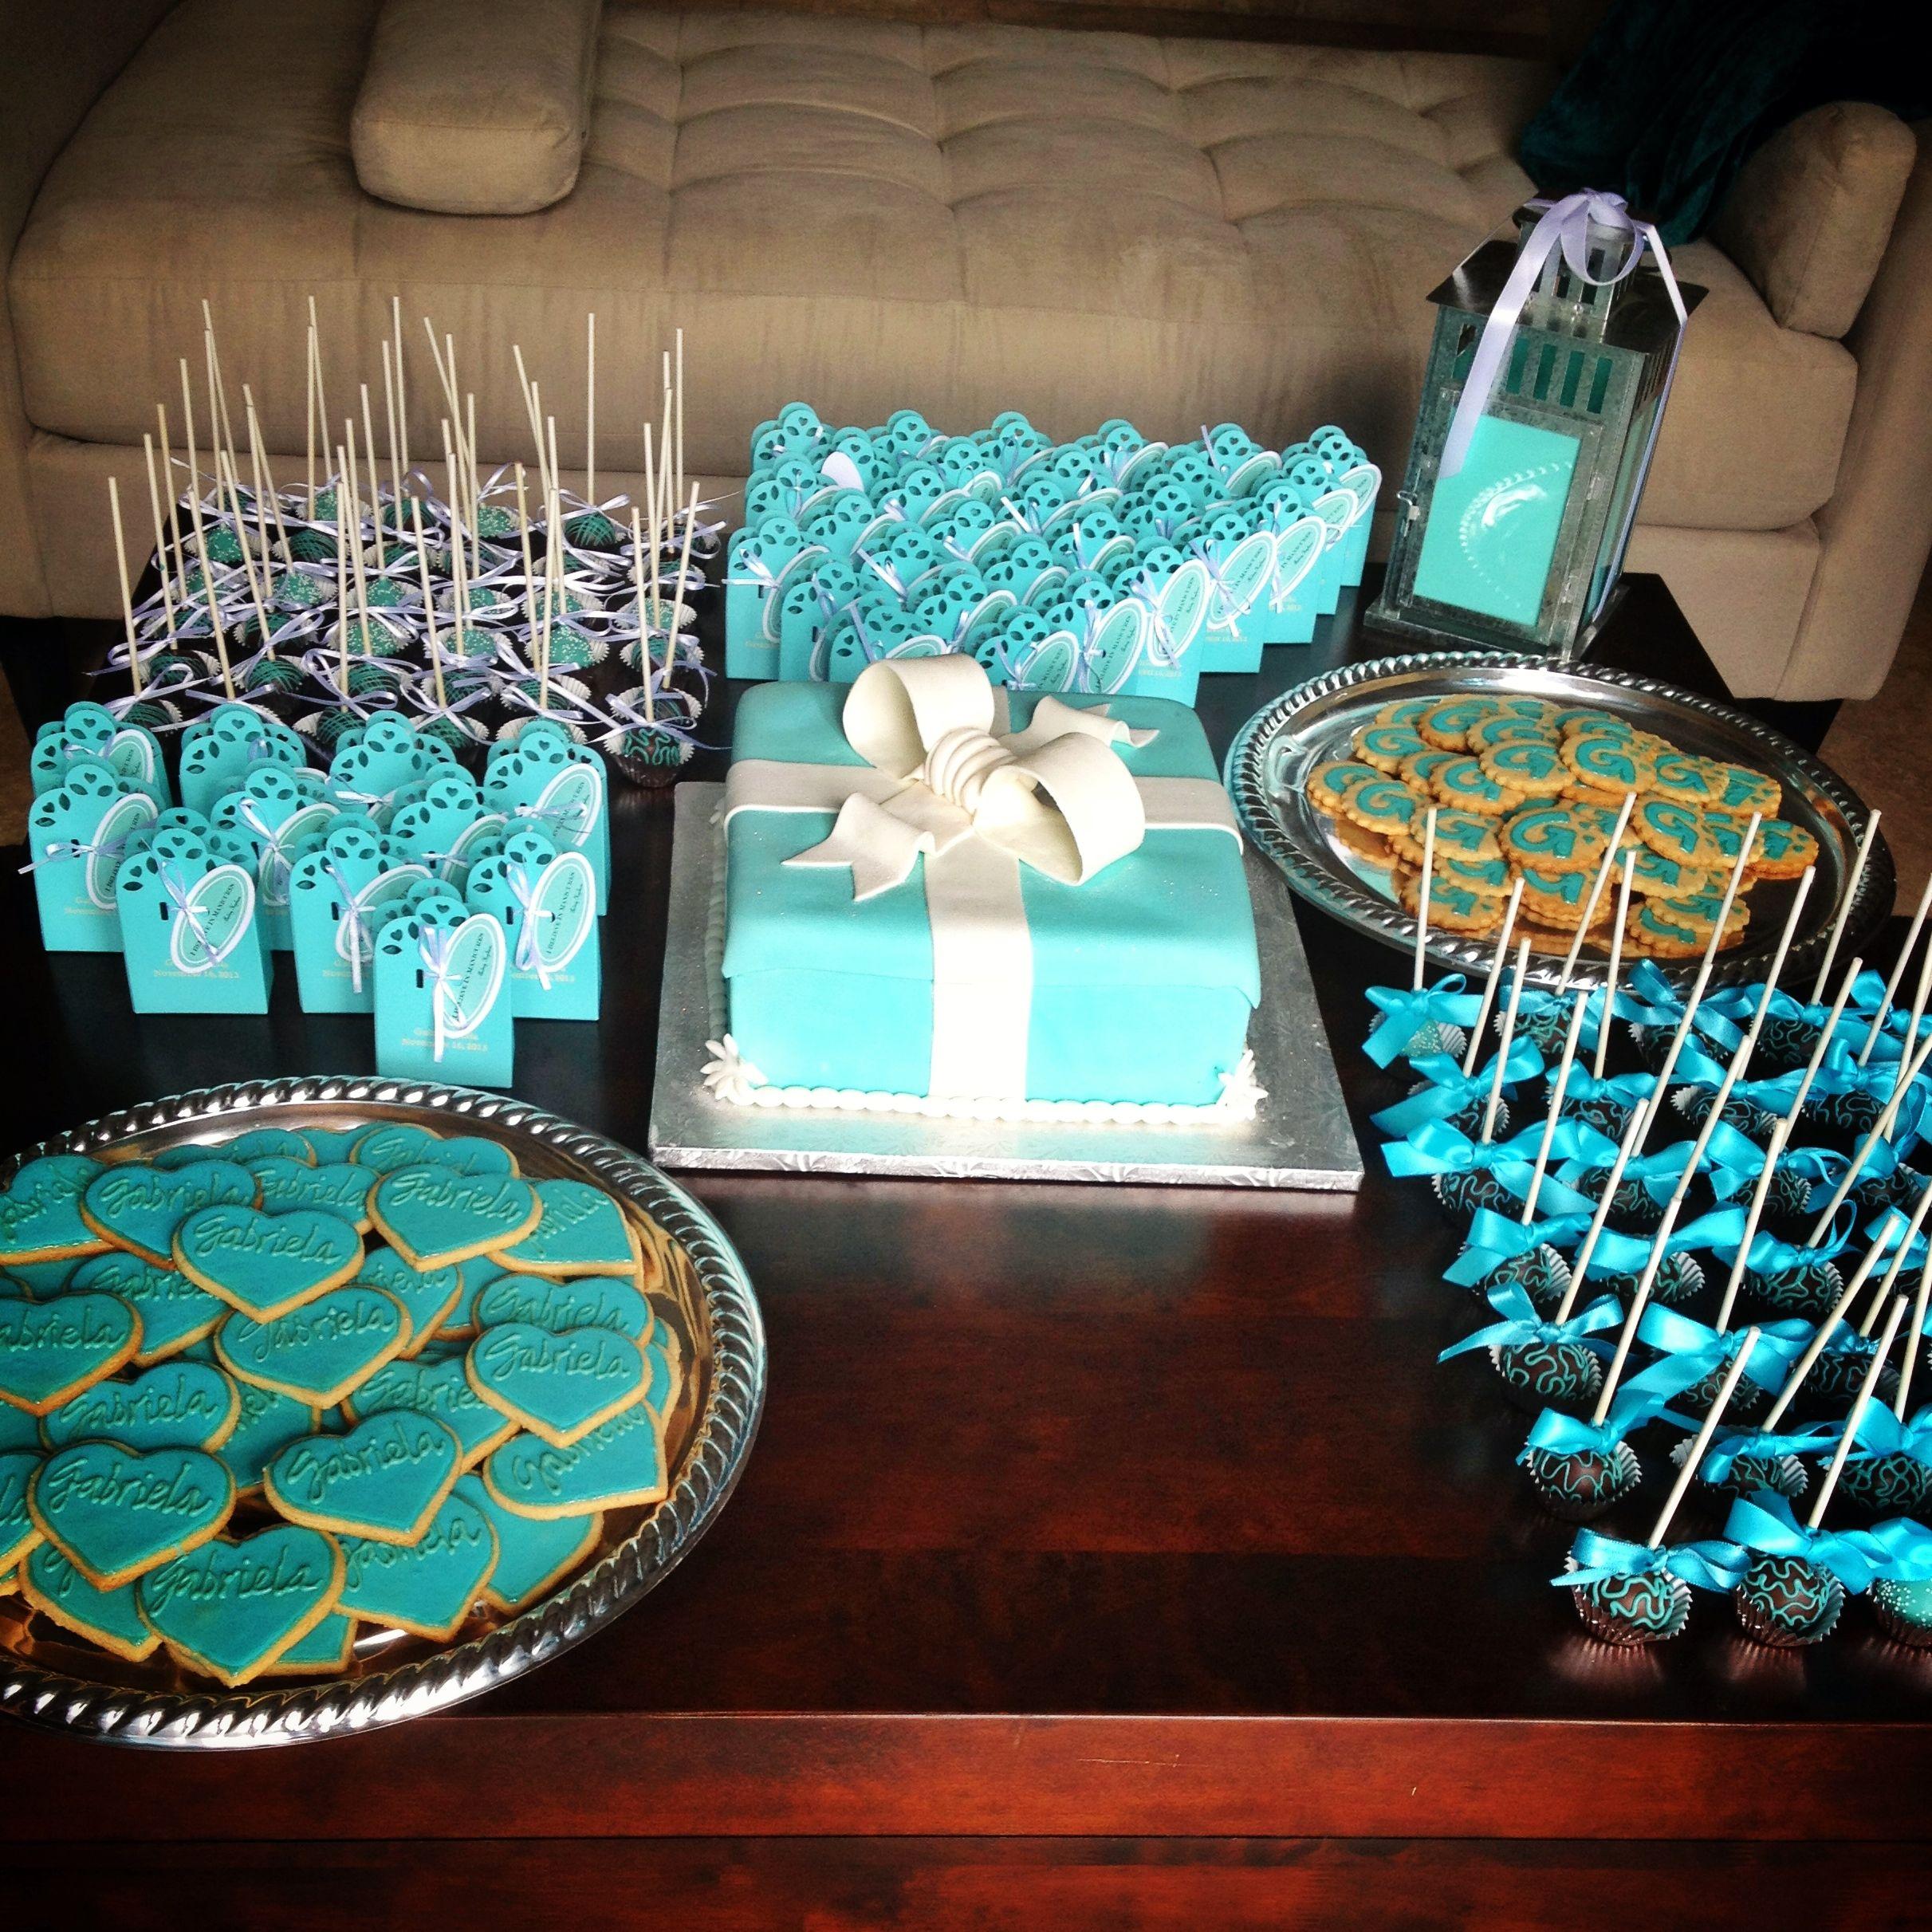 Tiffany Wedding Ideas: Breakfast At Tiffany's Themed Baby Shower Was A Success